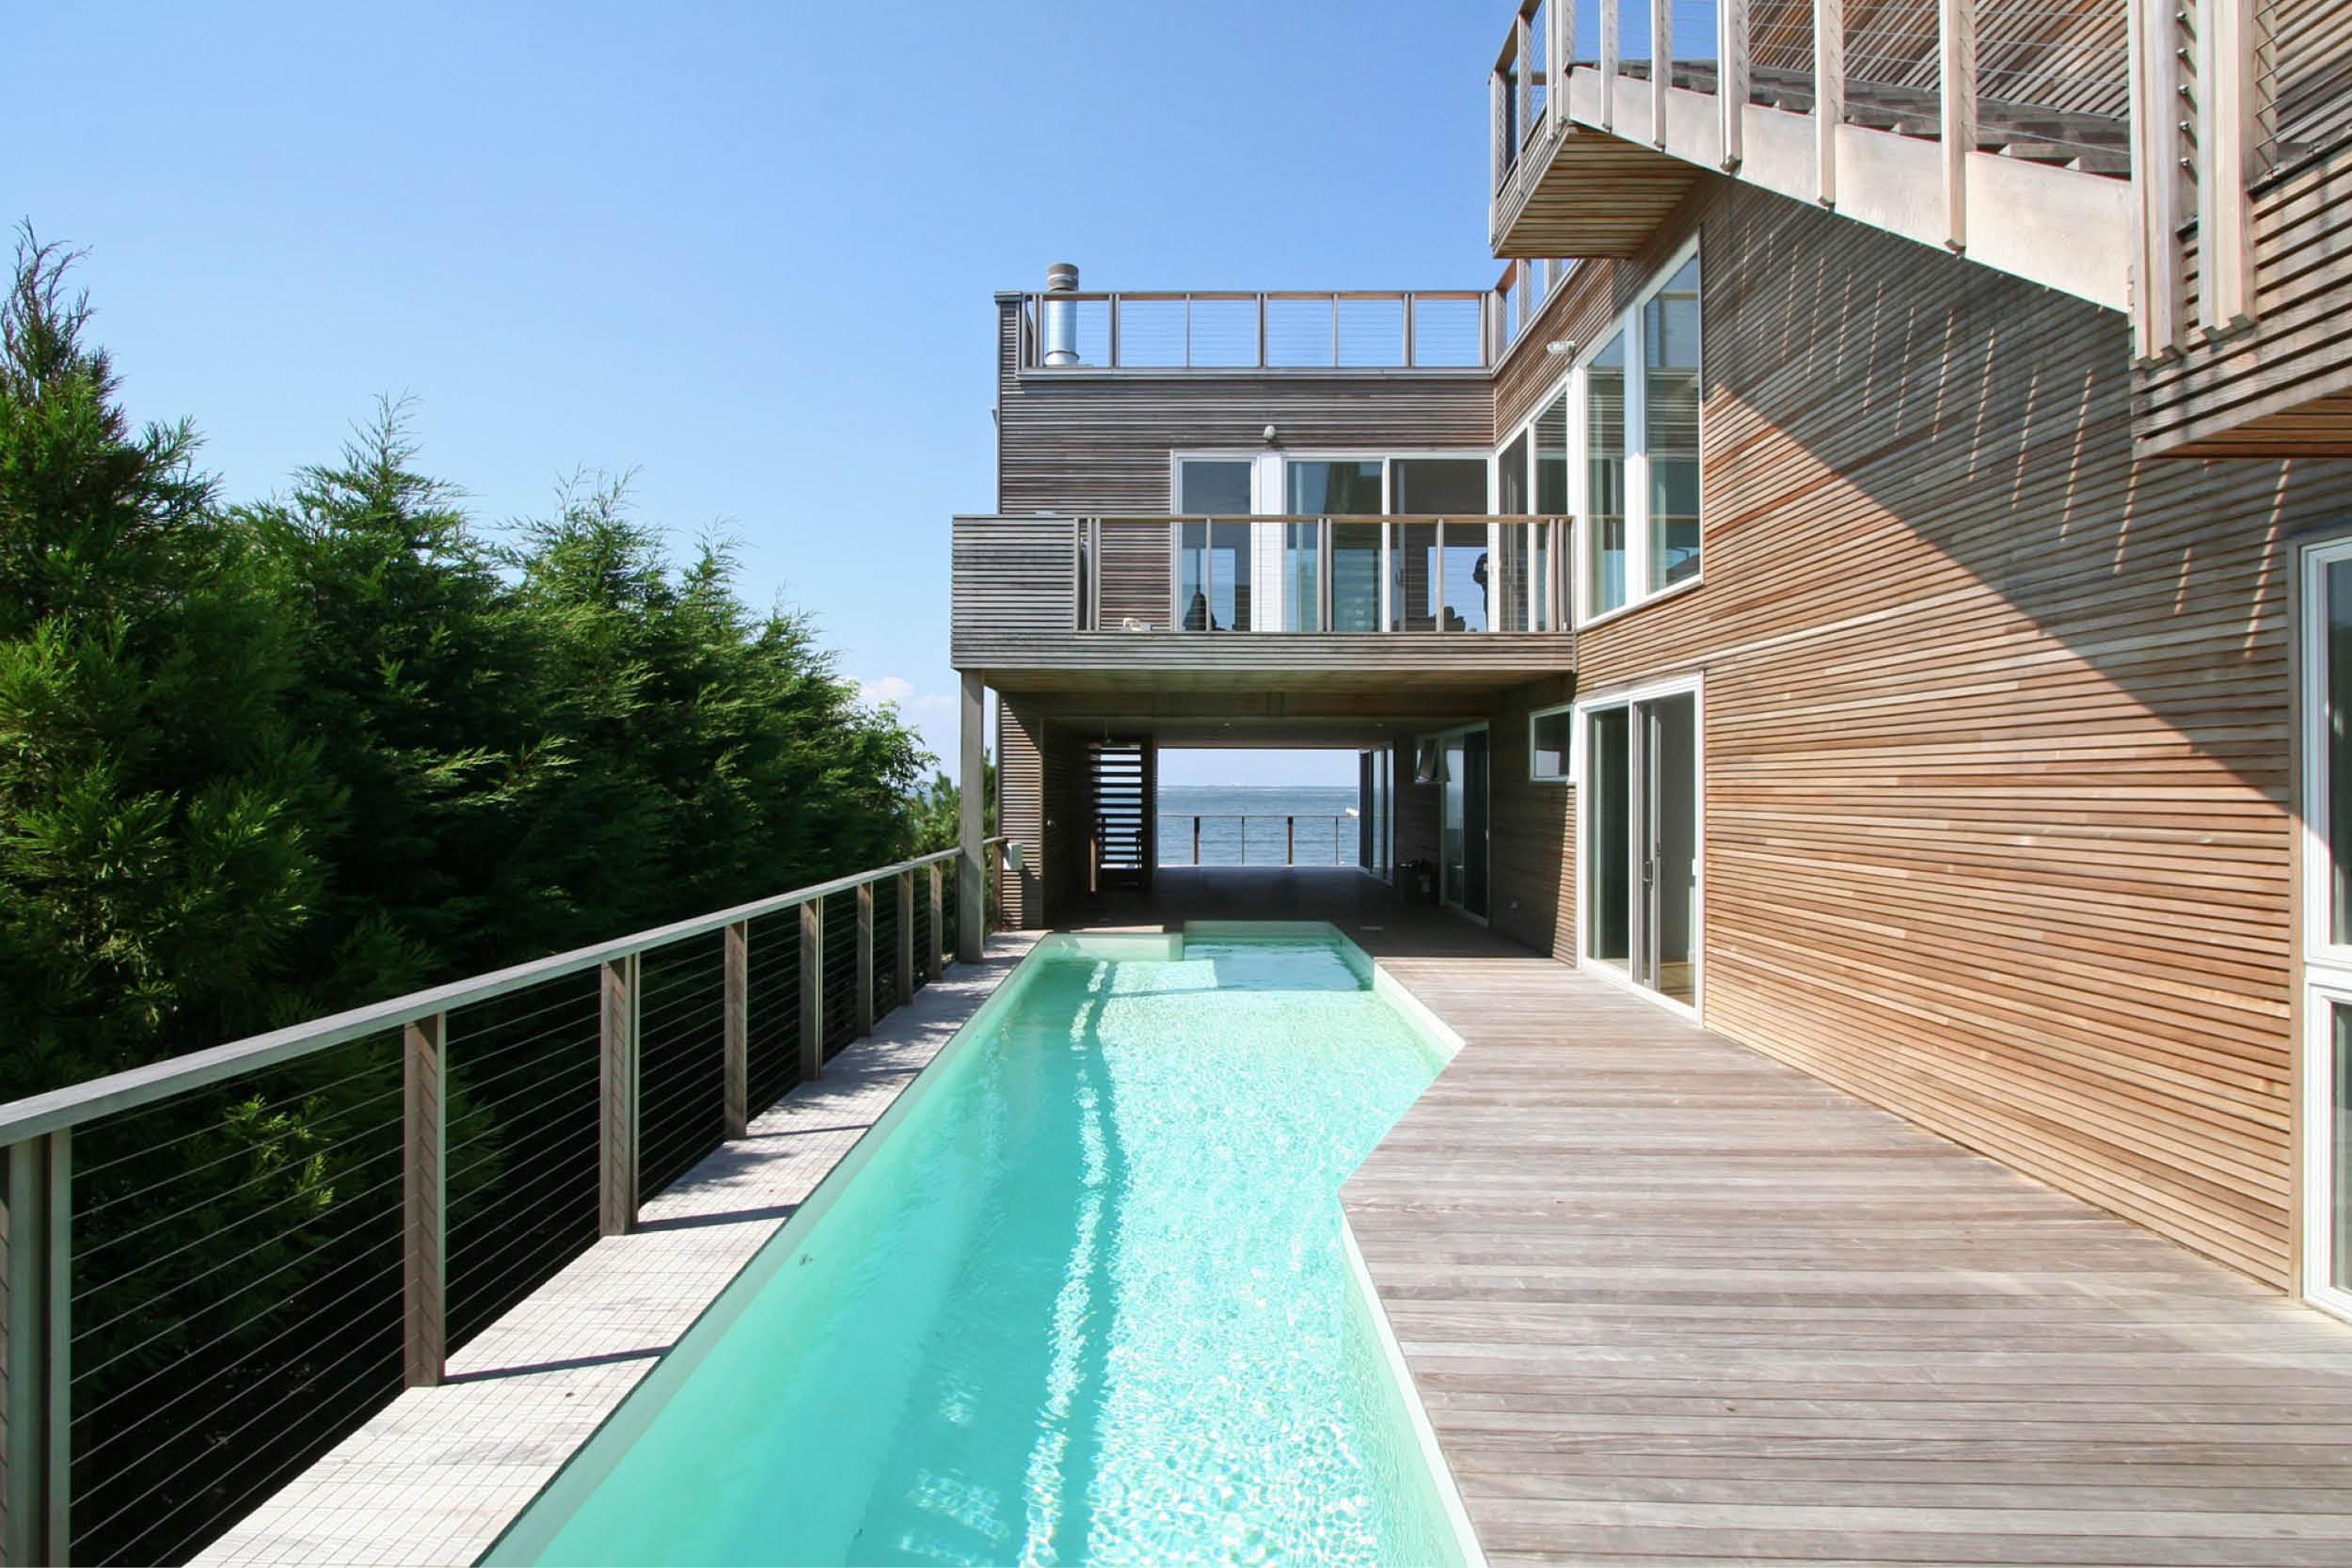 Modern Modular Prefab House | Cedar siding Beach White Windows Pool Ipe Deck | Fire Island New York | RES4